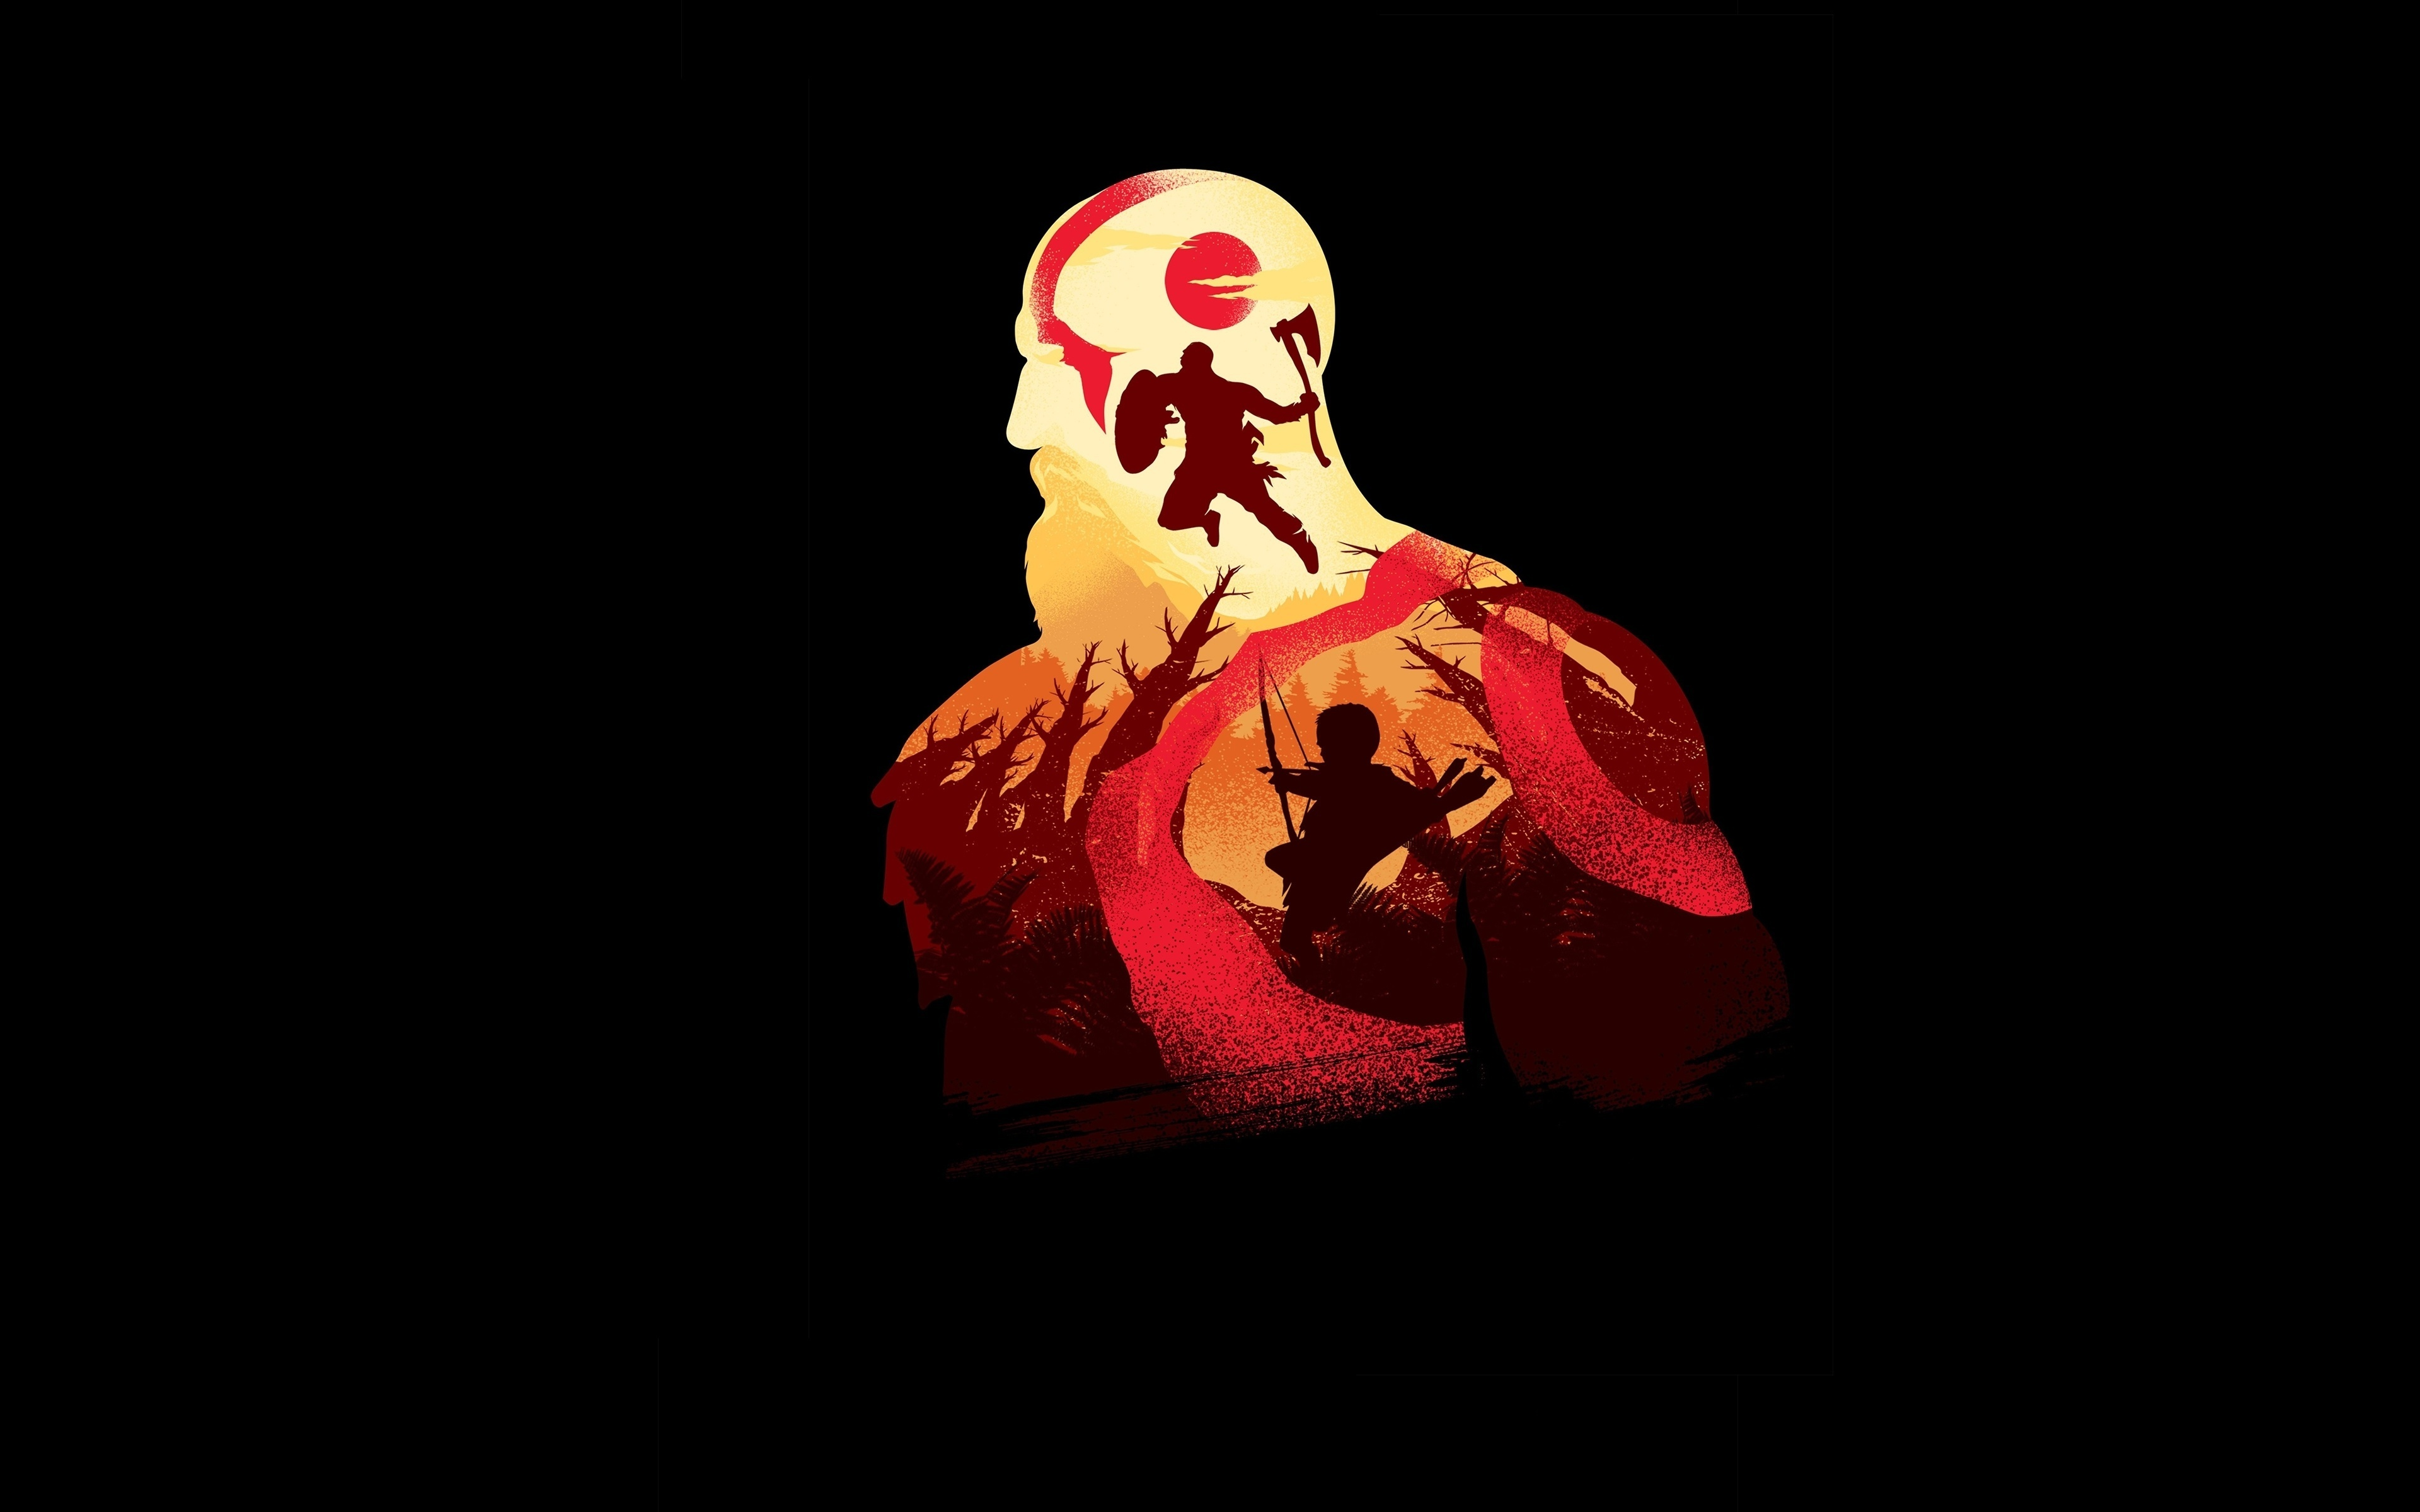 3840x2400 Minimal God Of War Game Artwork 2019 4k 3840x2400